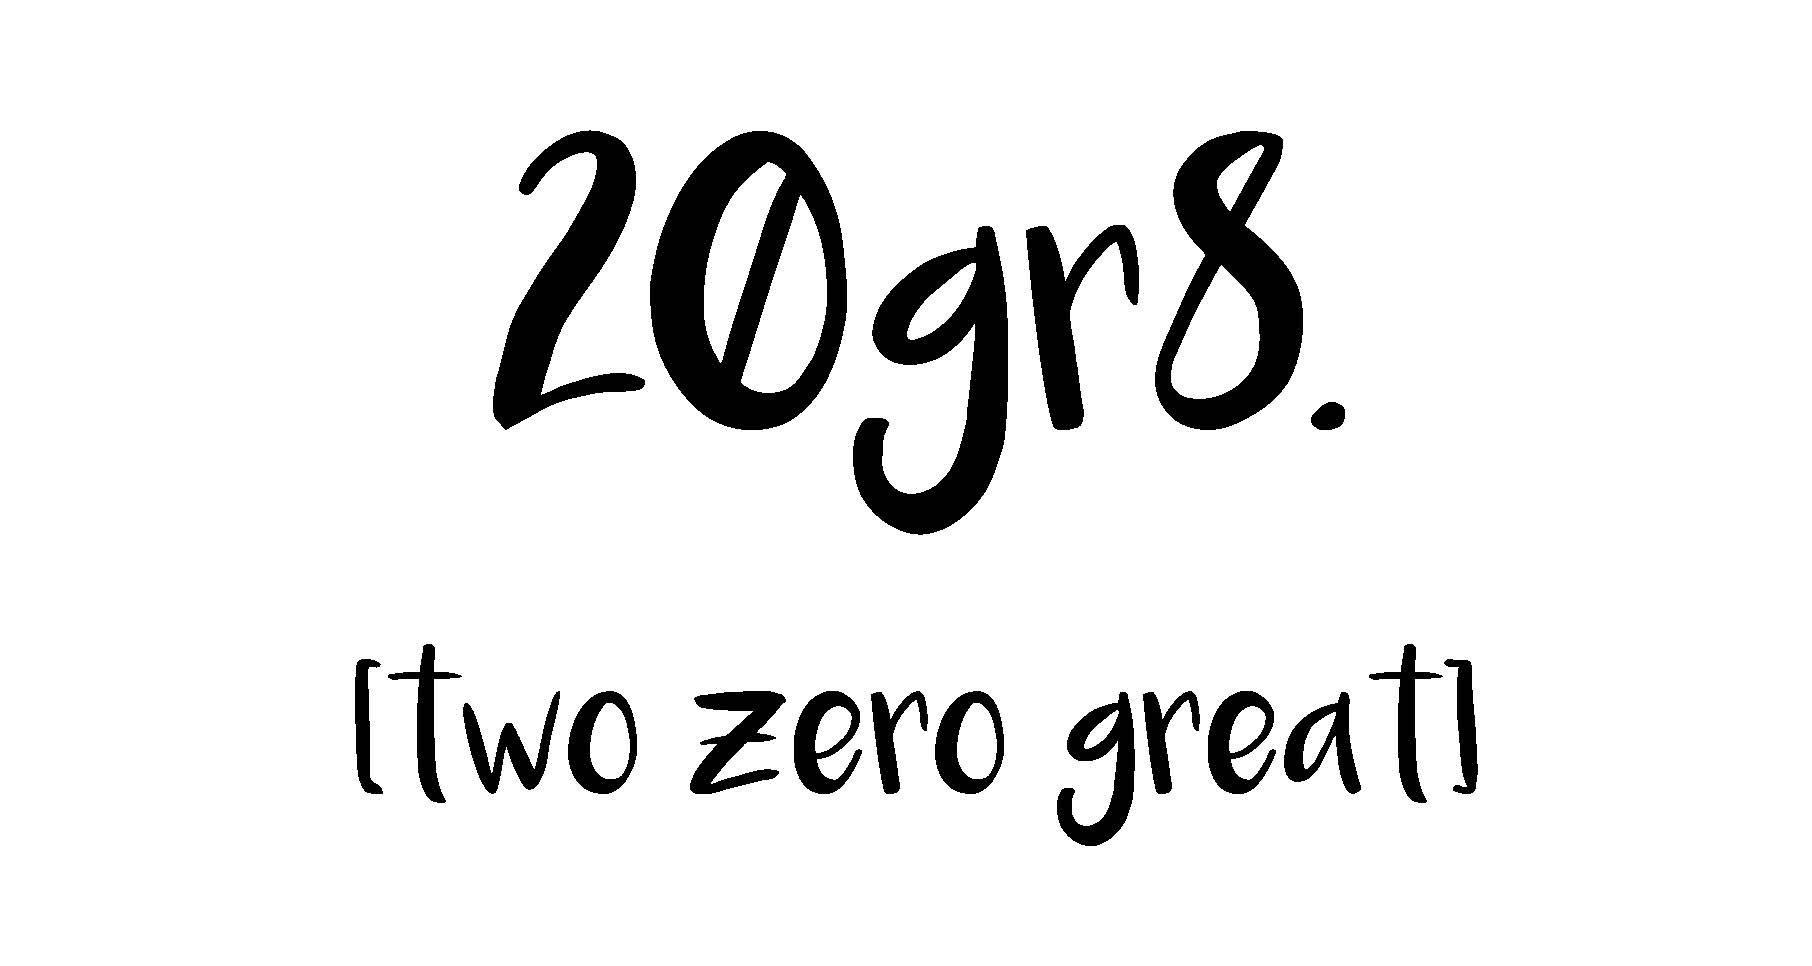 20GR8